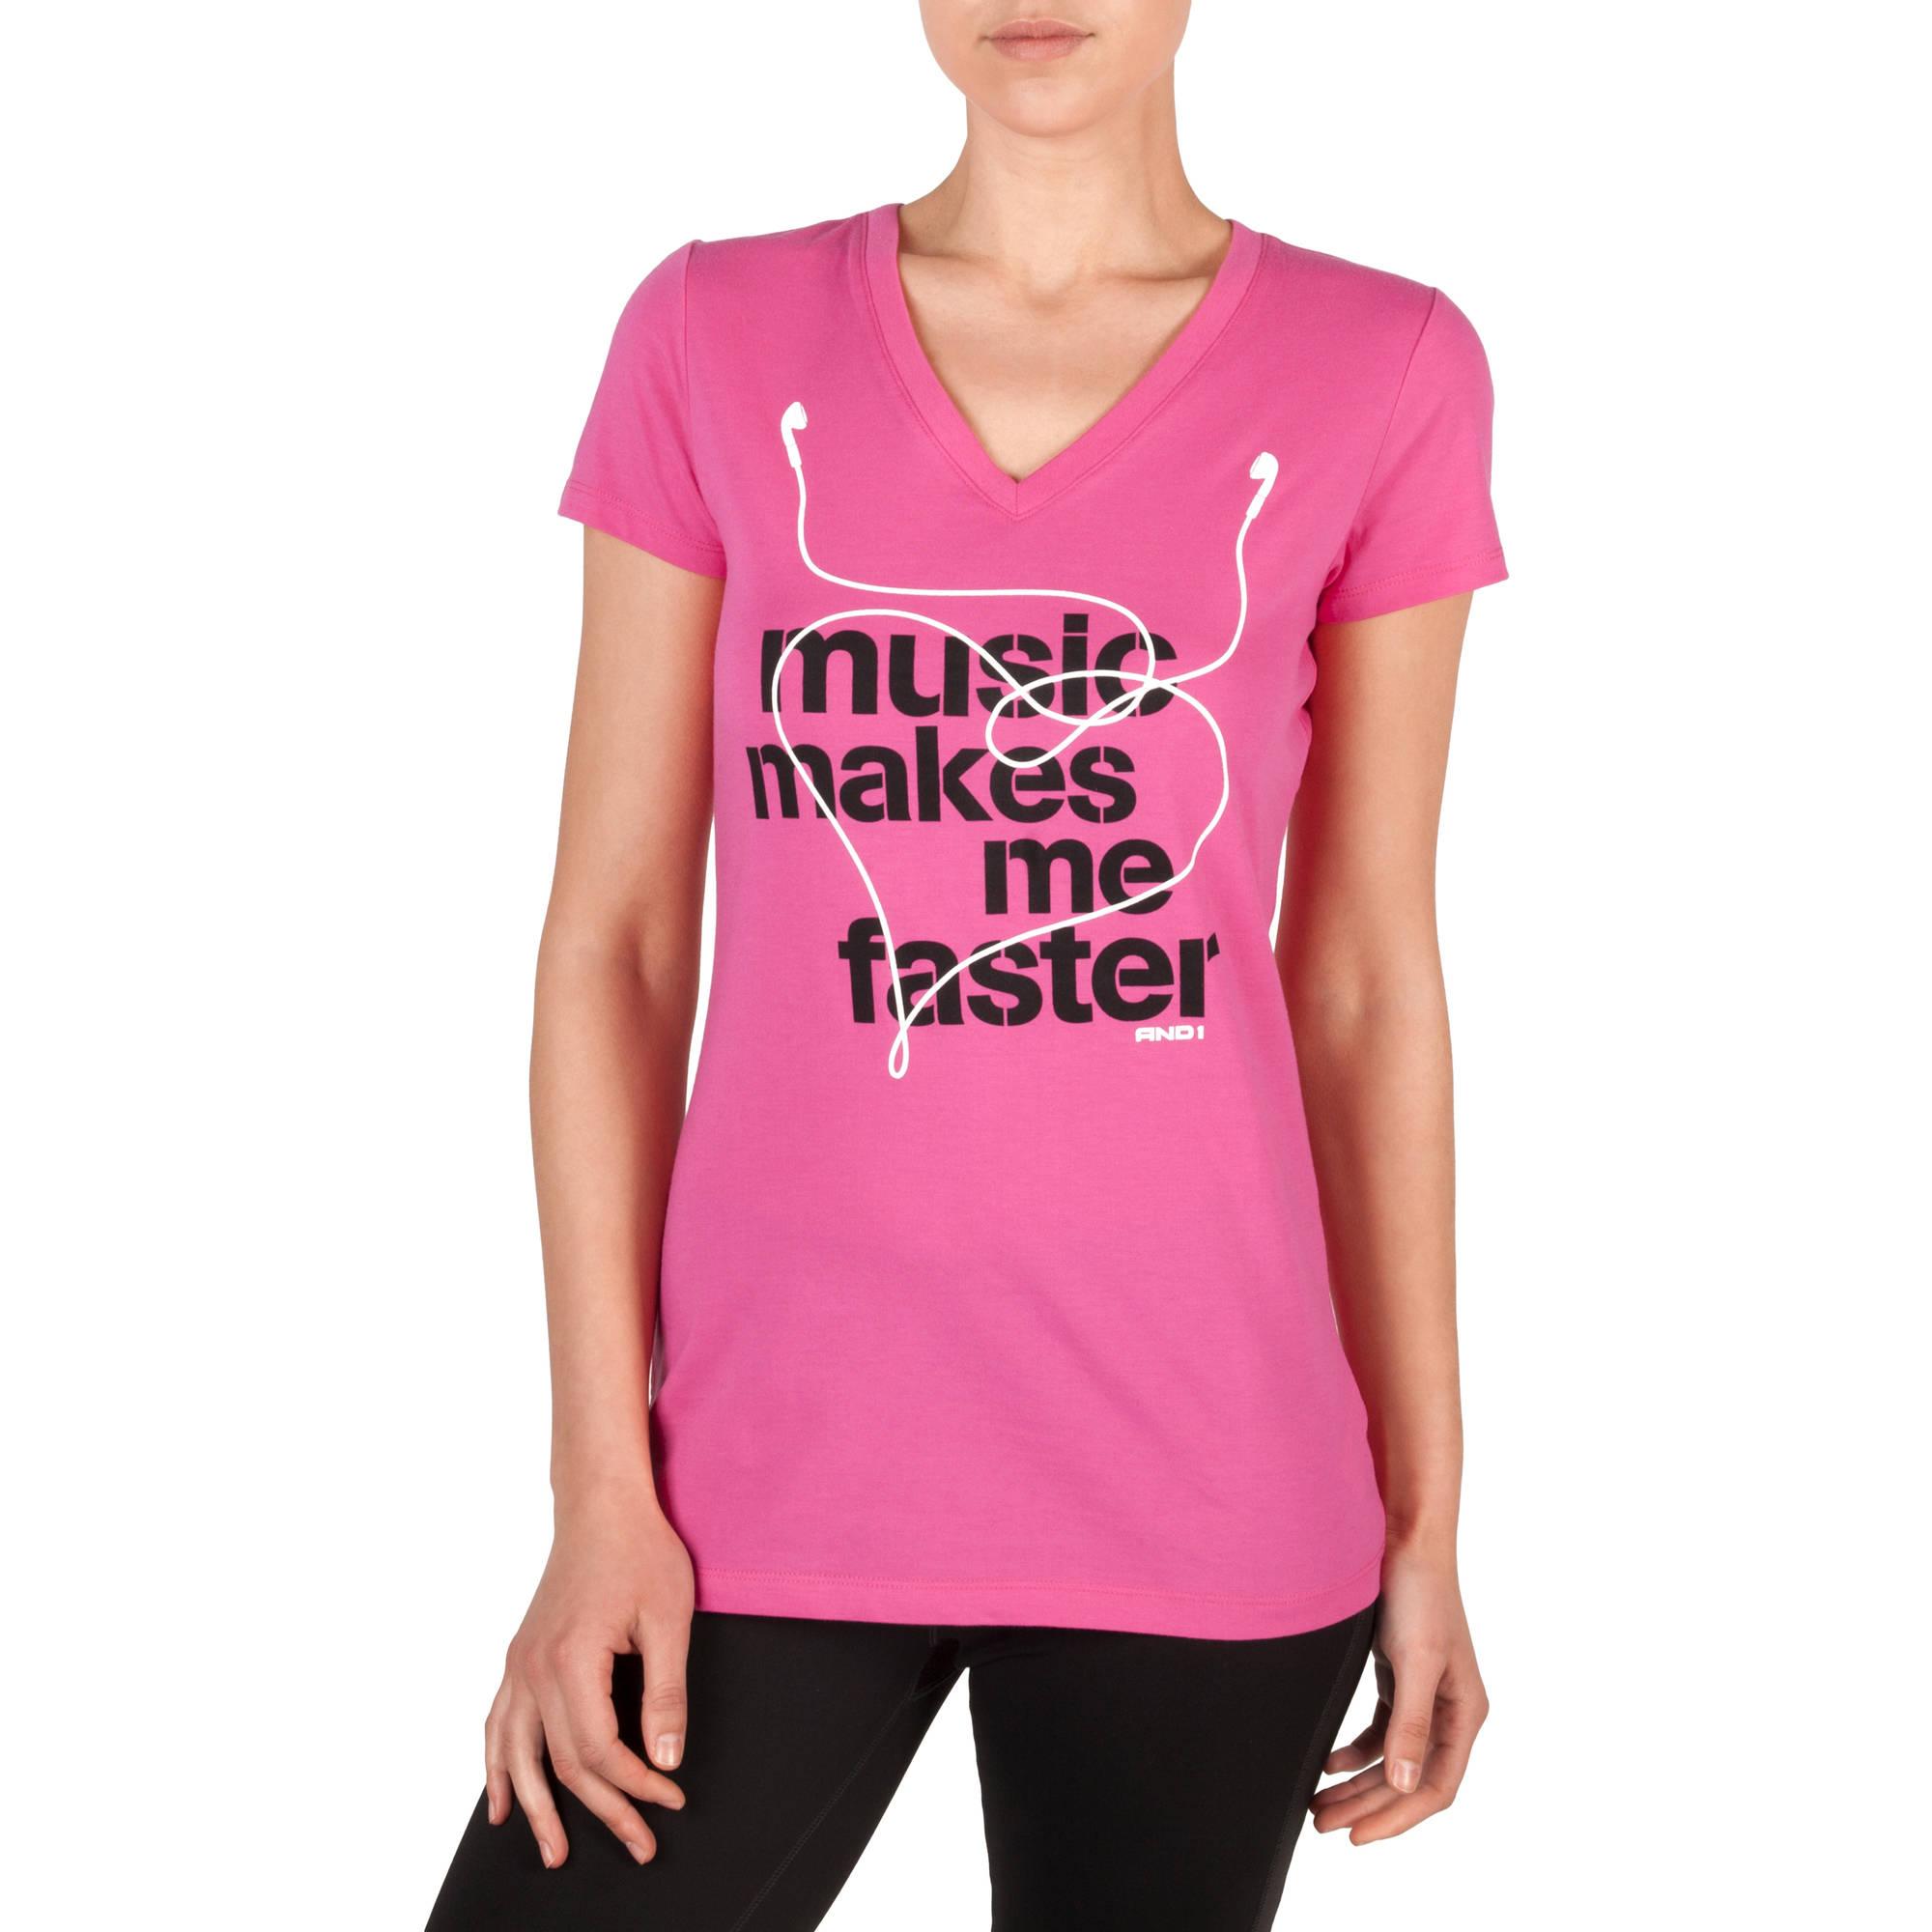 AND1 Women's Music Makes Me Faster Short Sleeve V-Neck T-Shirt